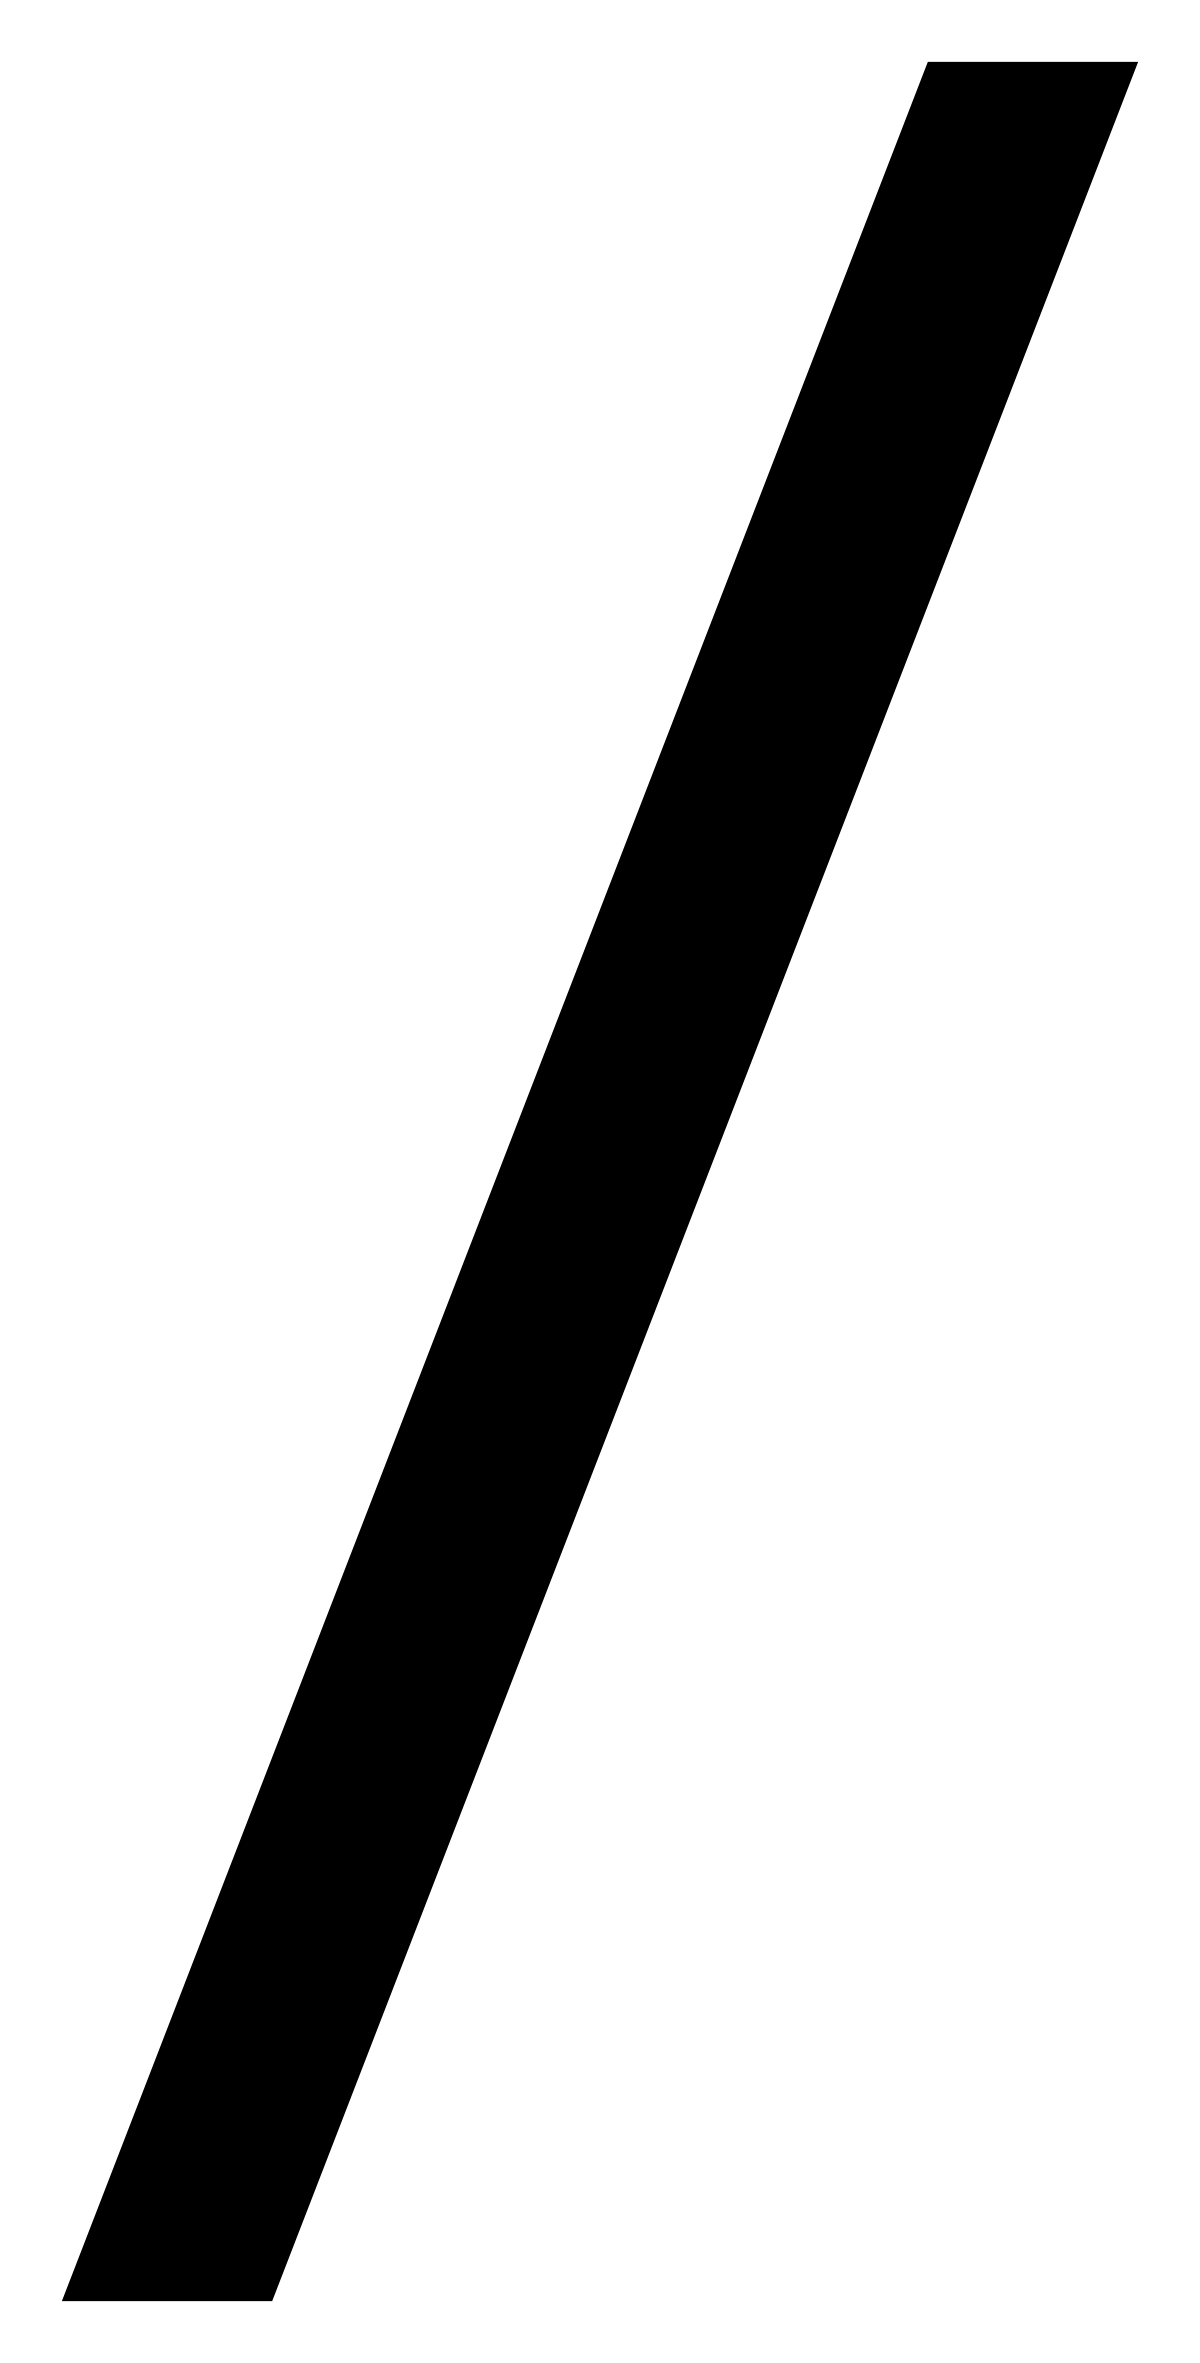 черная полоса картинка без фона вот